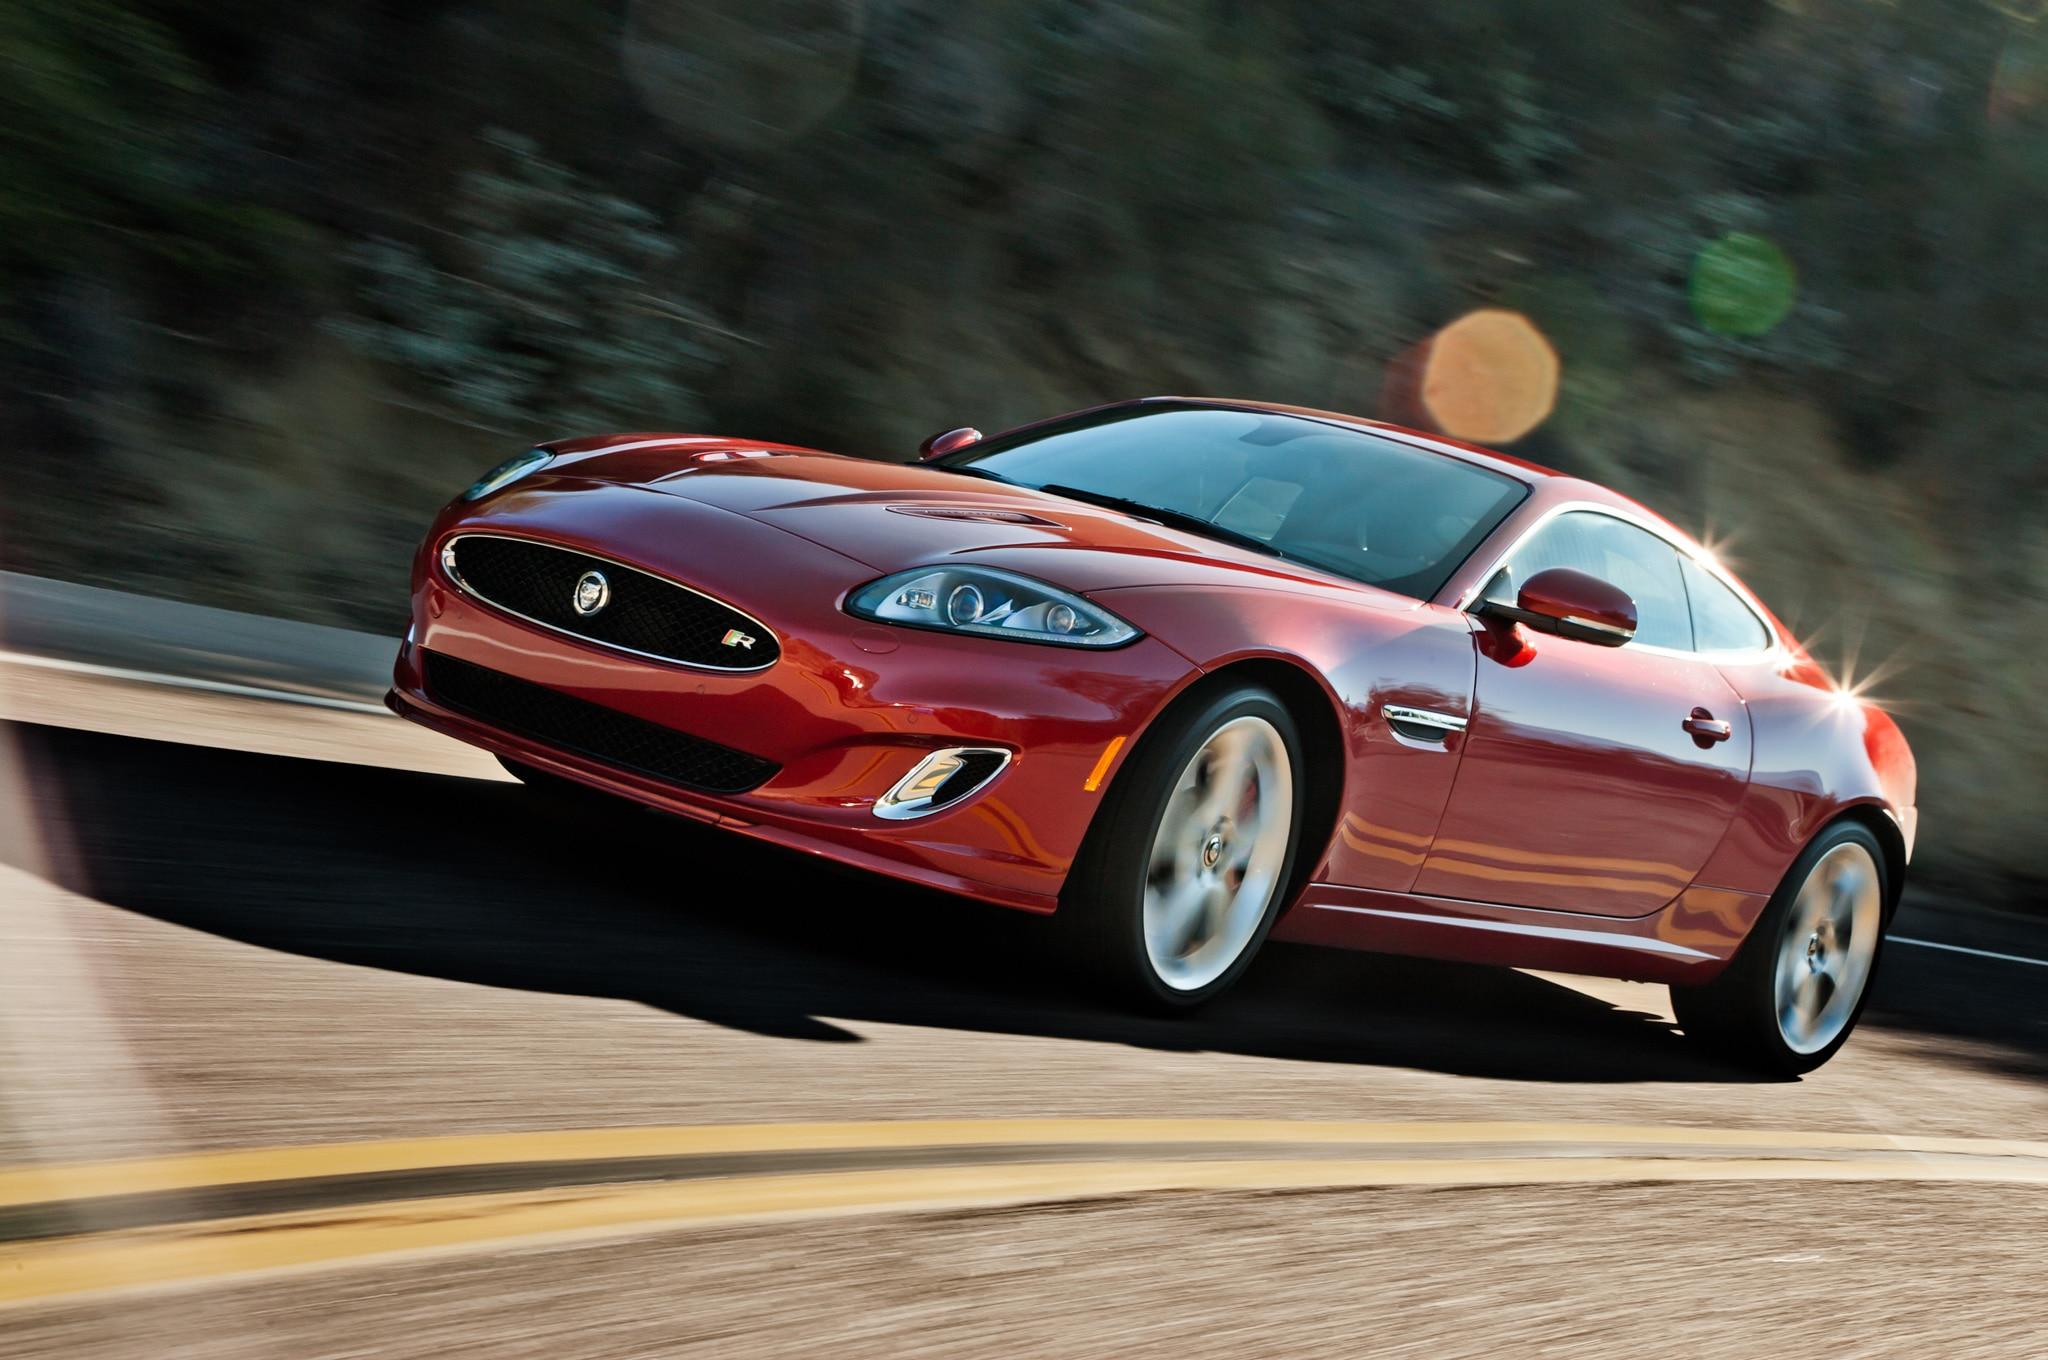 2013 Jaguar Xk Base Price Drops To 79 875 Xkr Drop Top